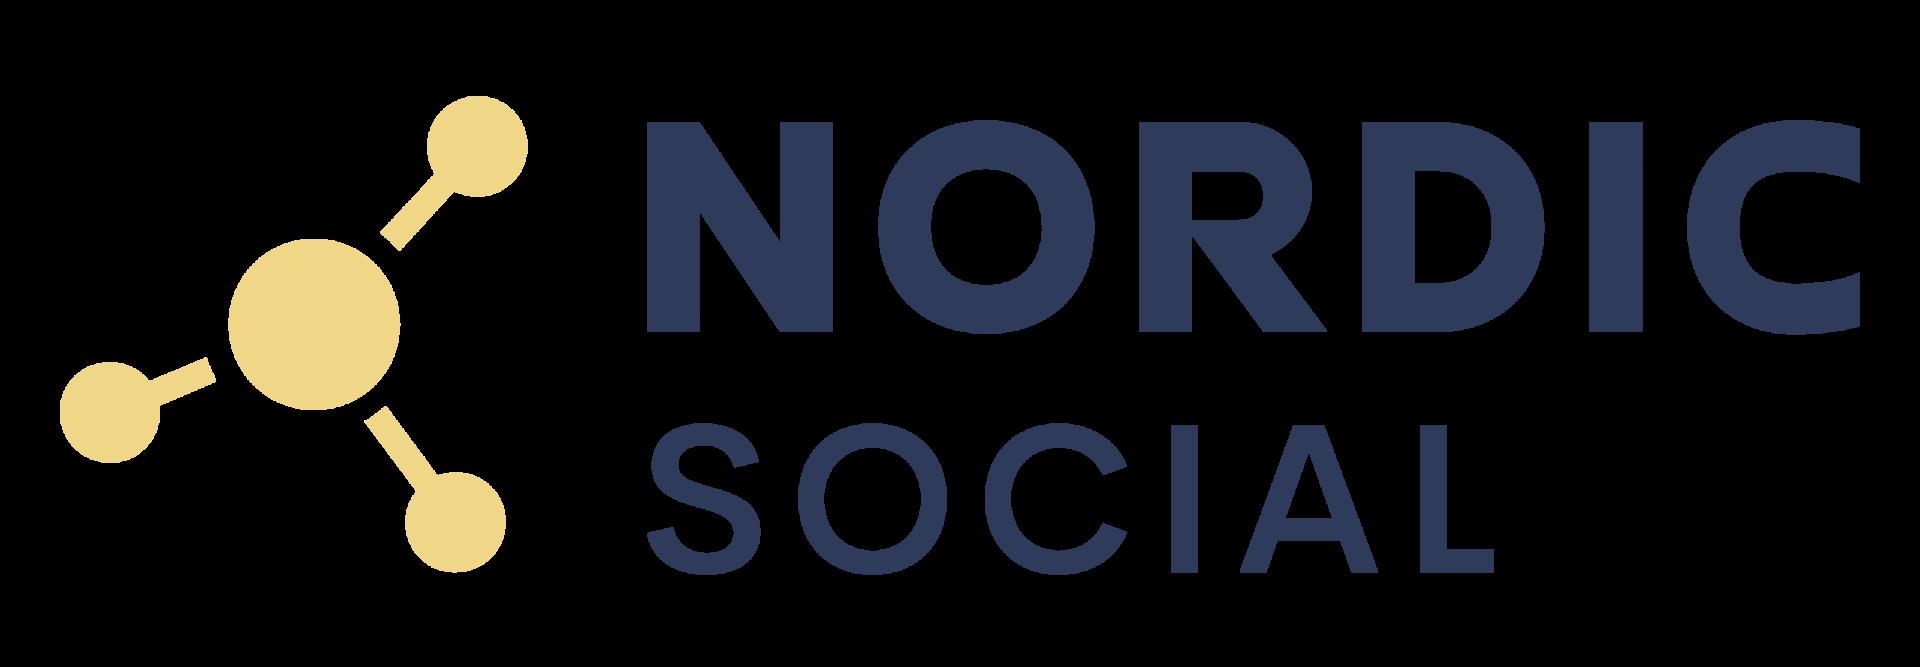 Nordic Social